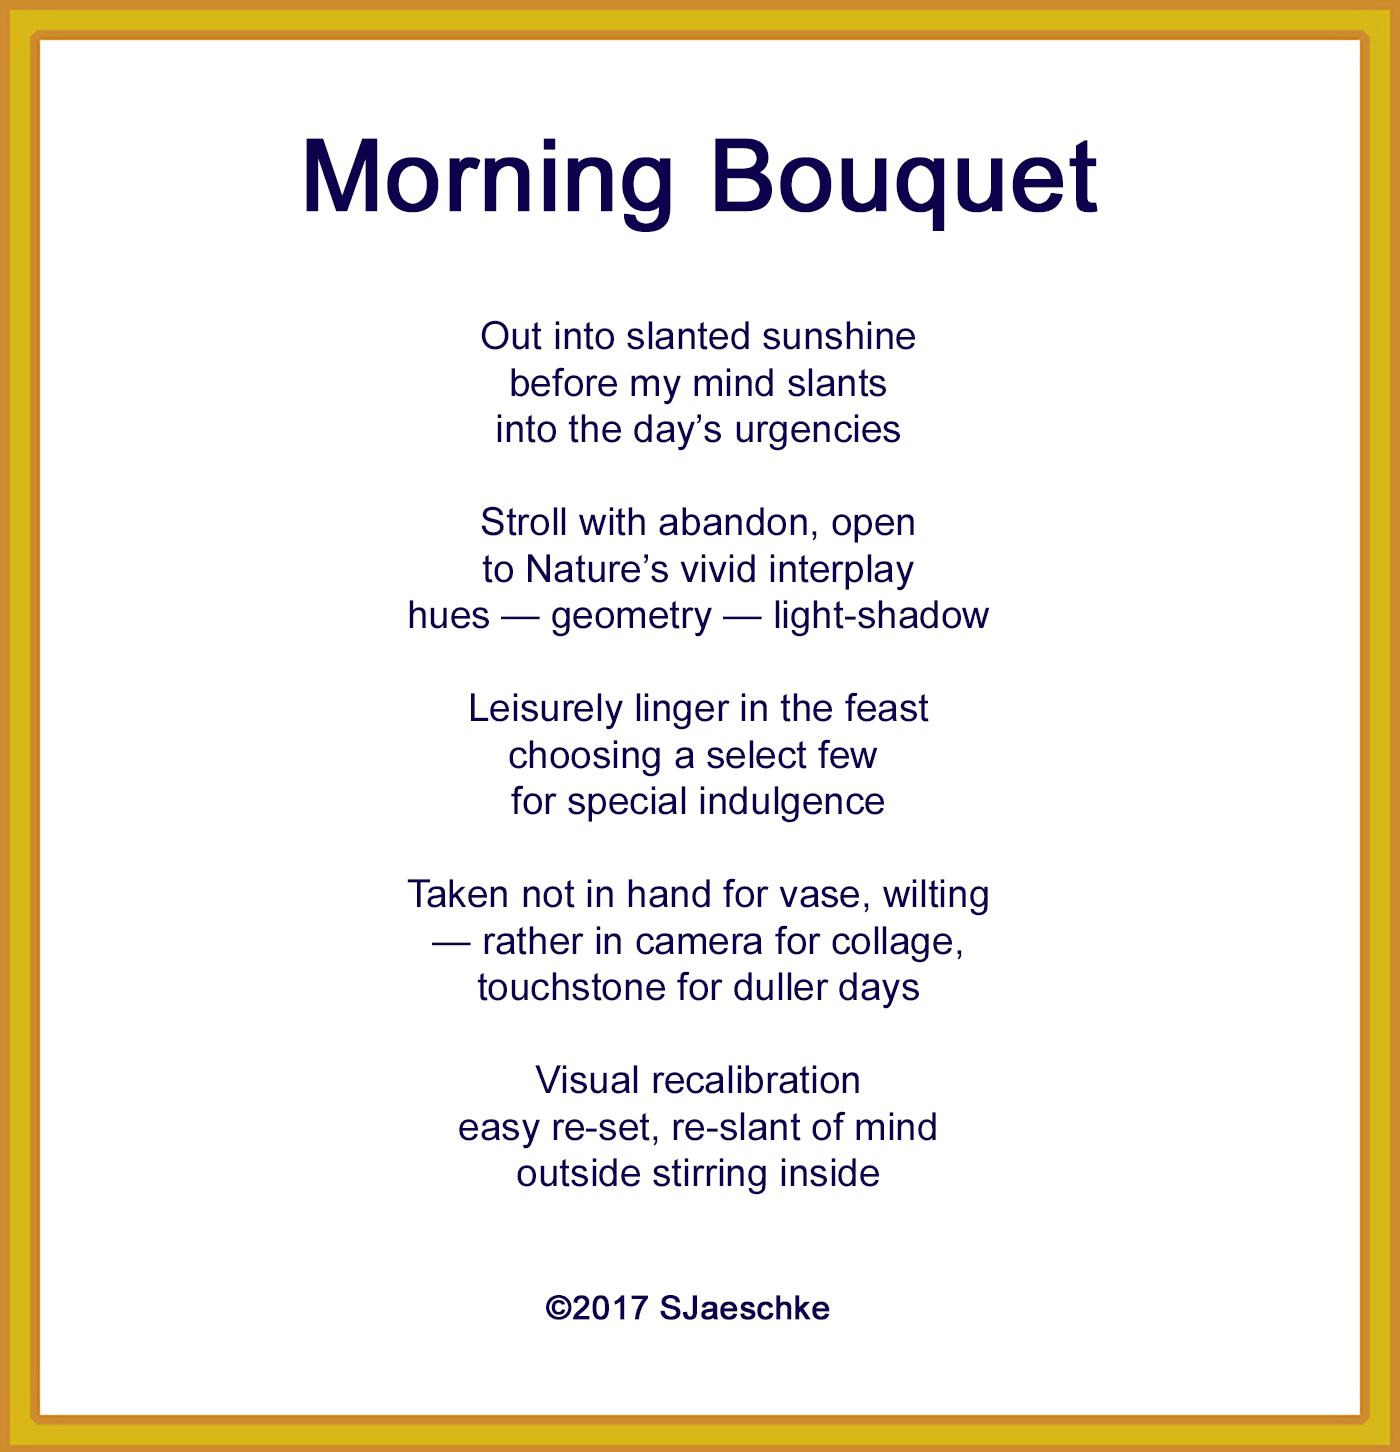 Post_2017-04-20_Poem_MorningBouquet